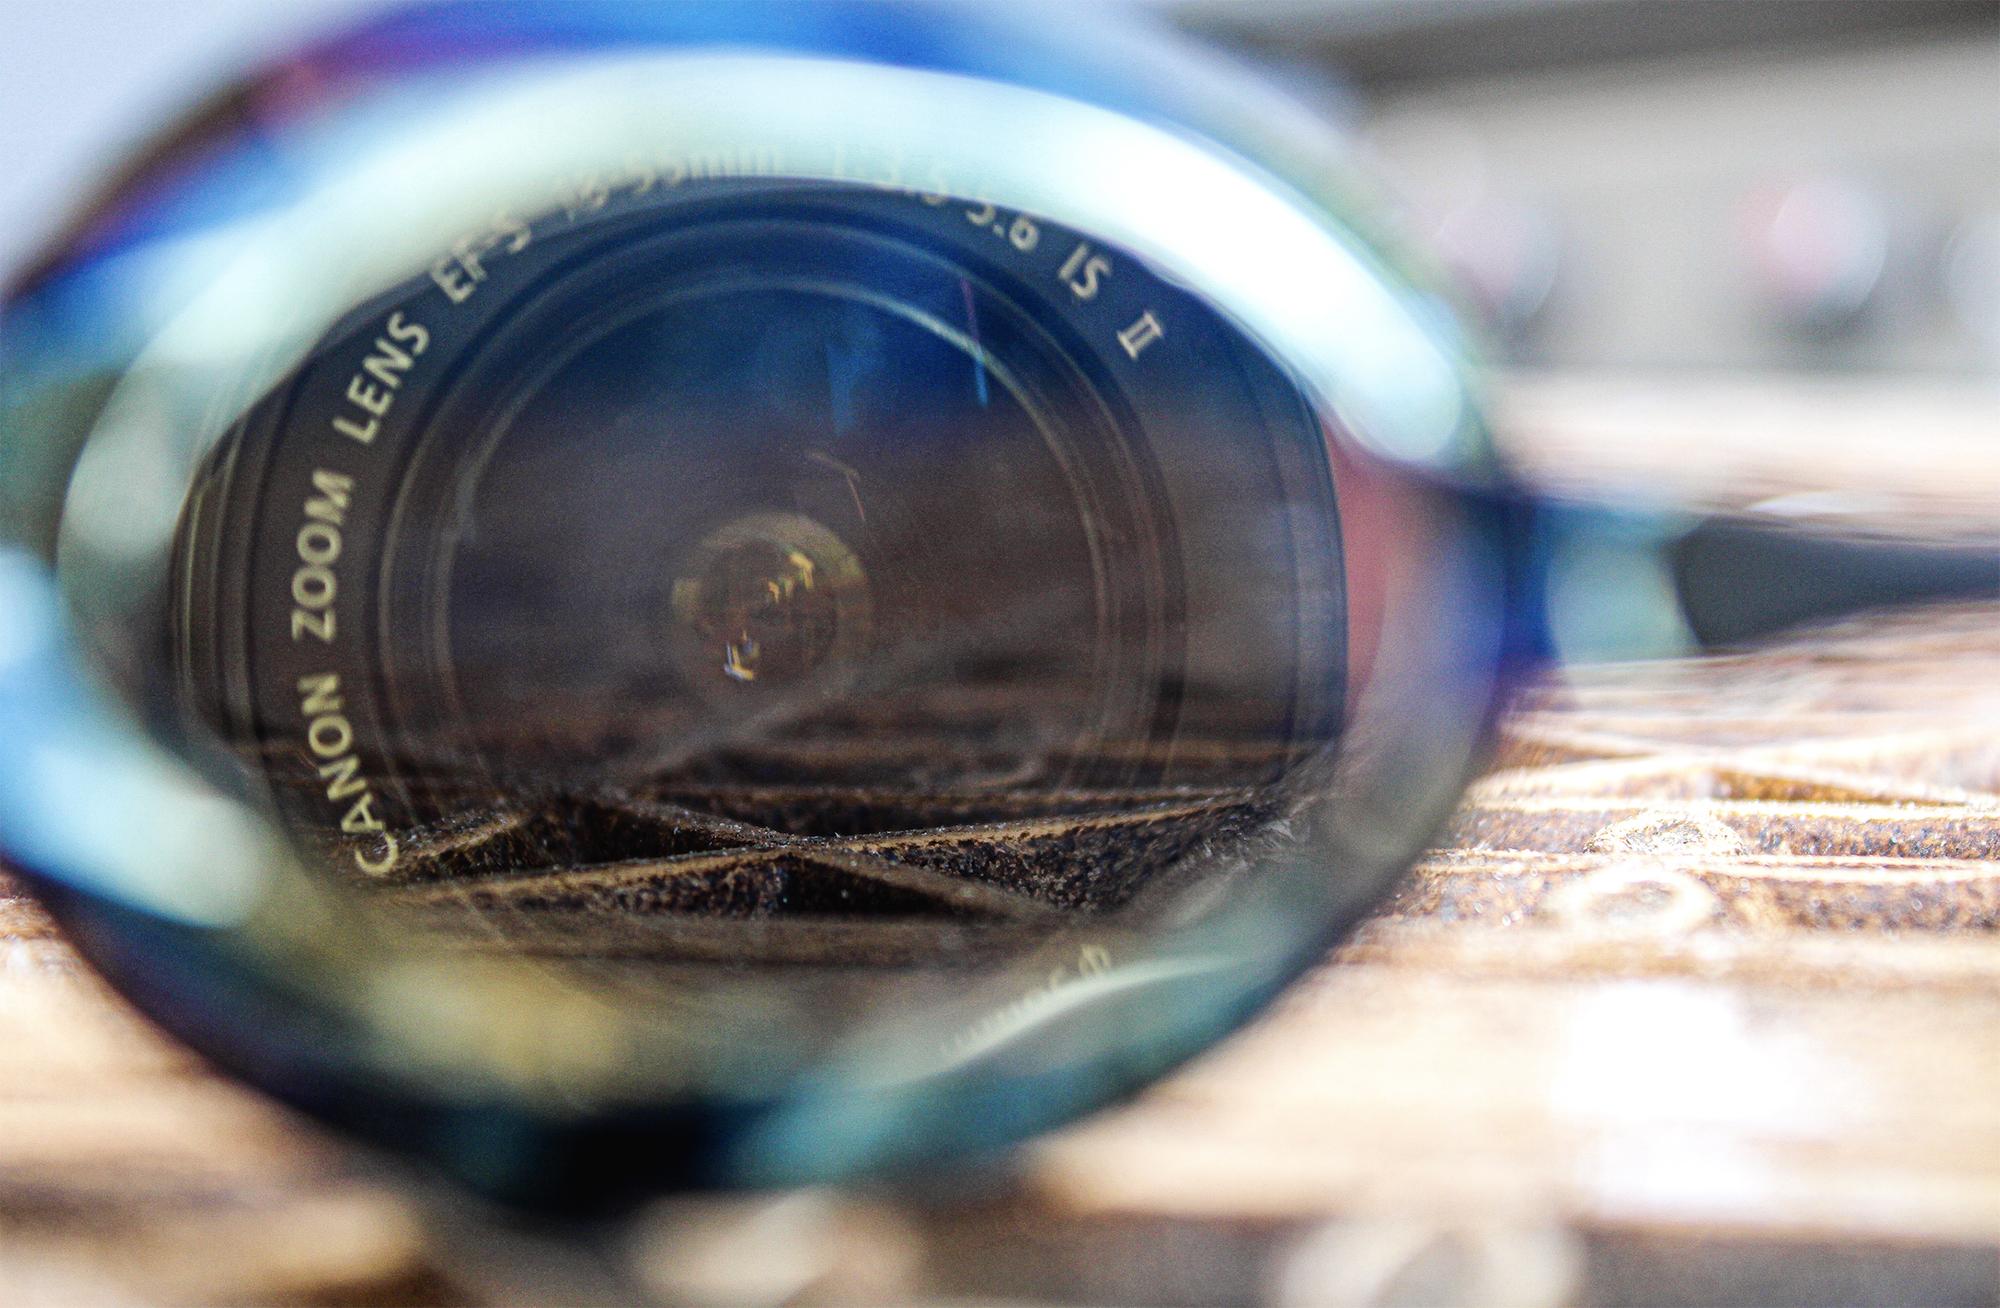 1st. Anna Palfy, Goggles